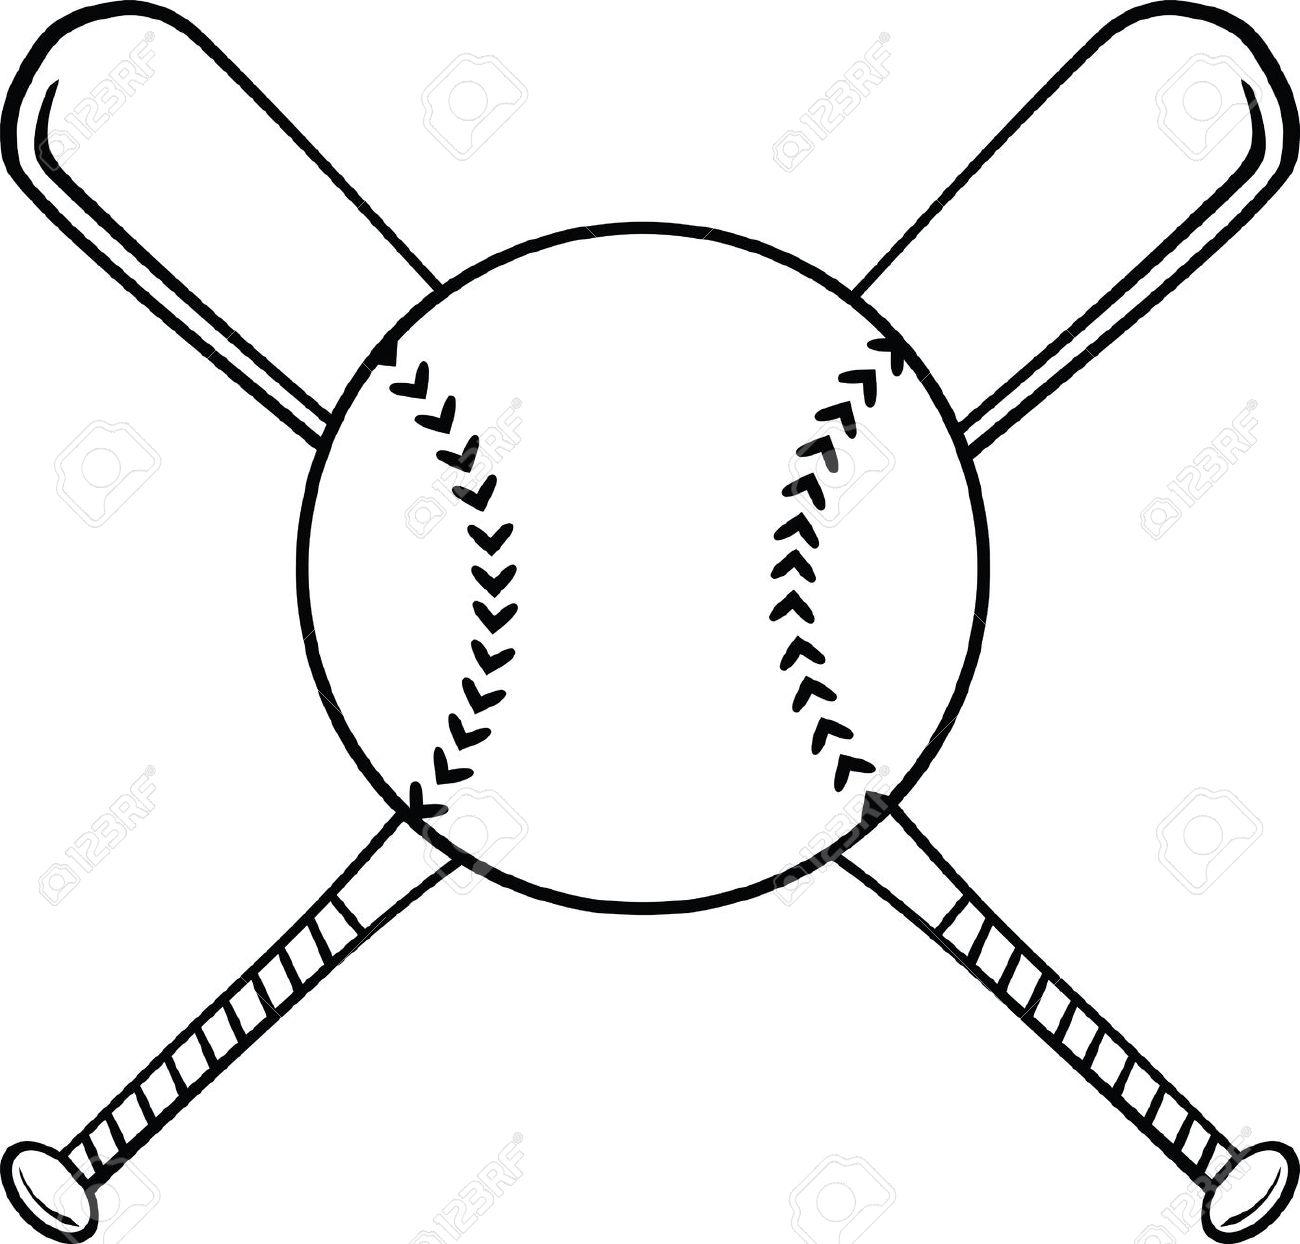 1300x1244 Softball Ball And Bat Clipart